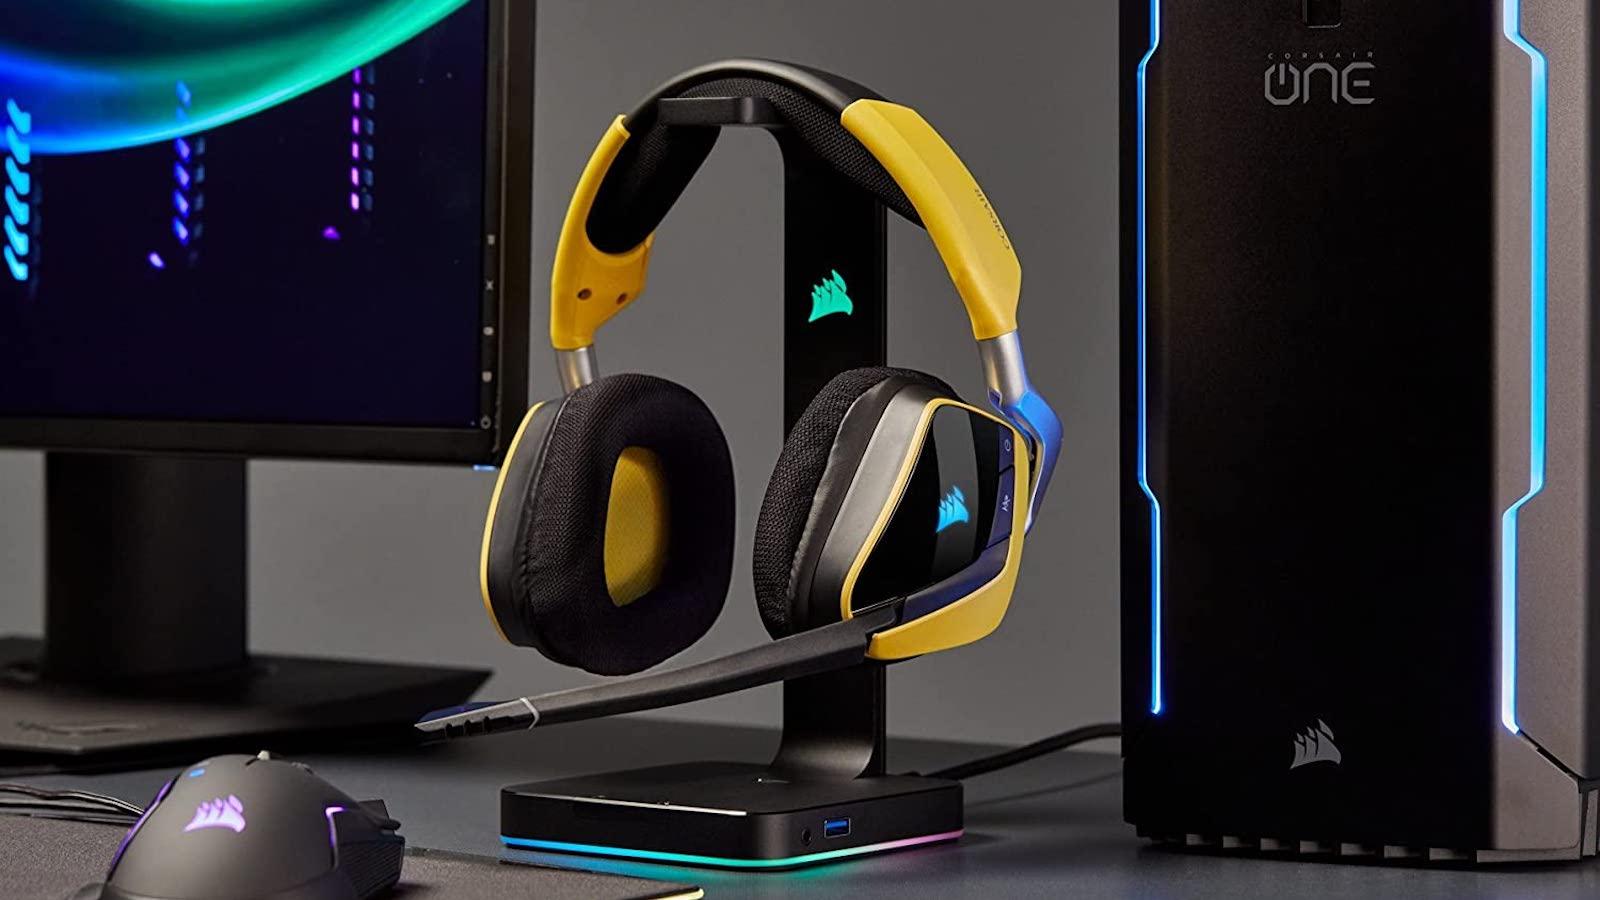 CORSAIR VOID ELITE Gaming Headphones boast 7.1 surround sound